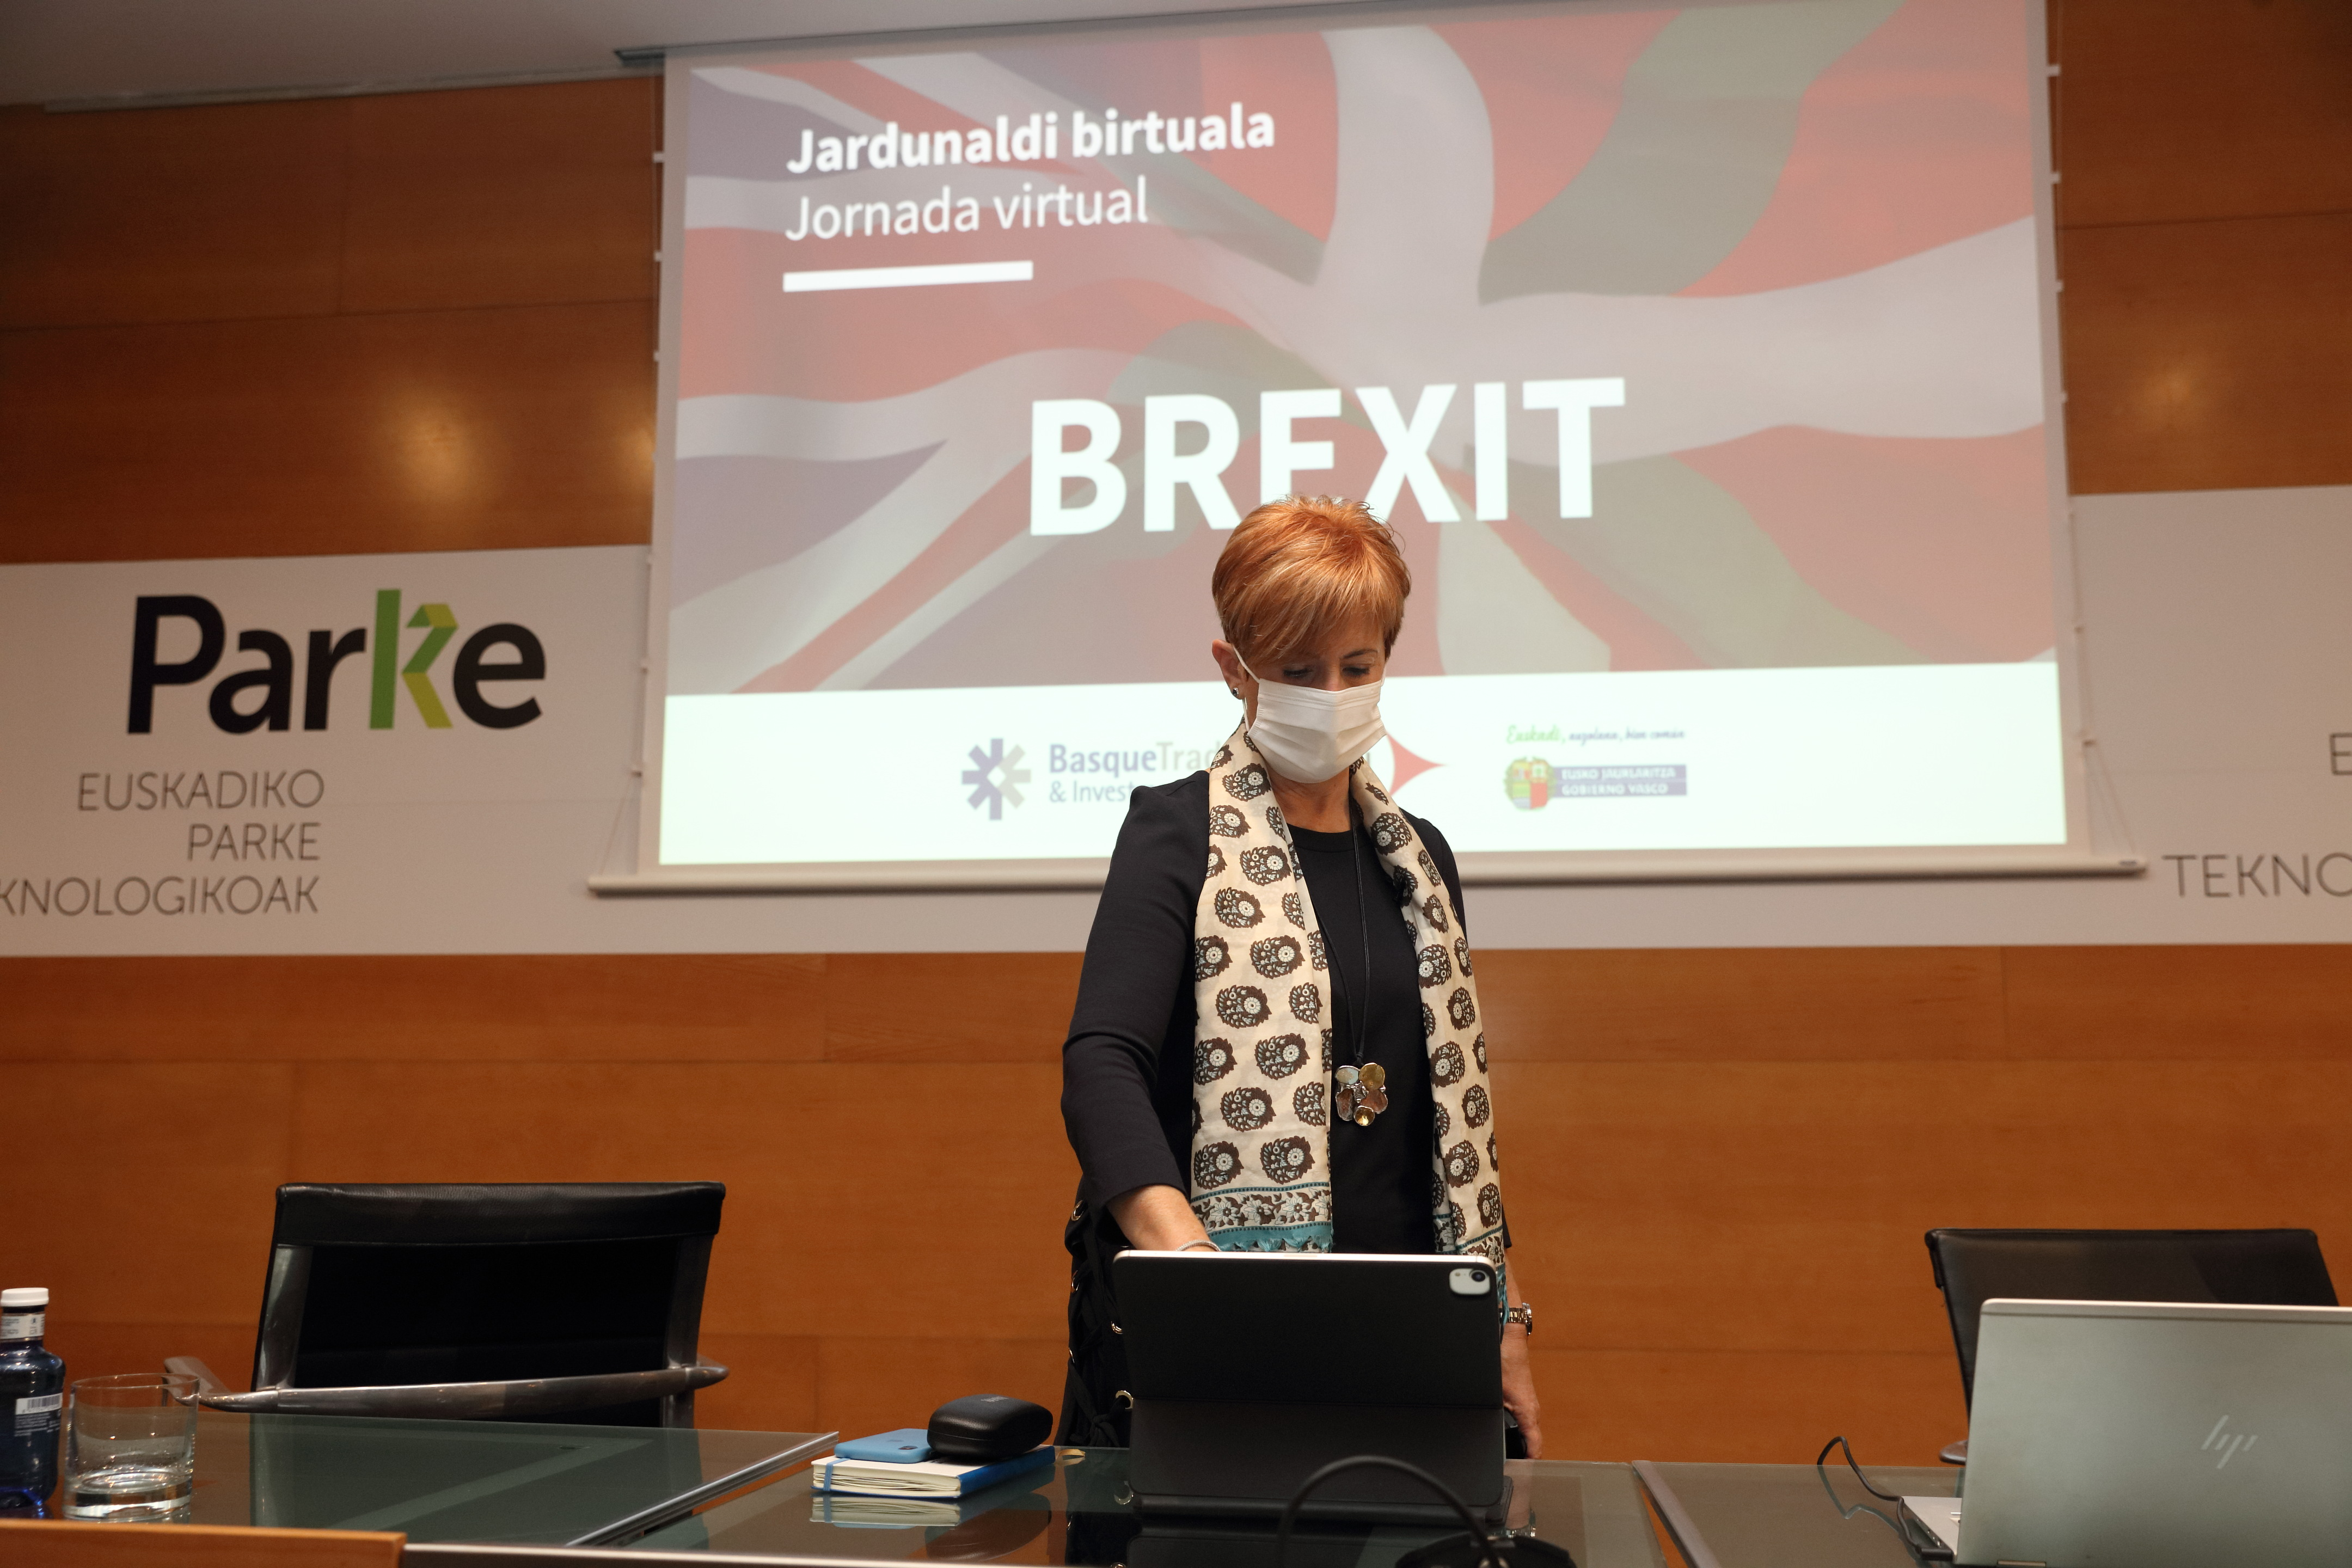 Brexit_003.JPG